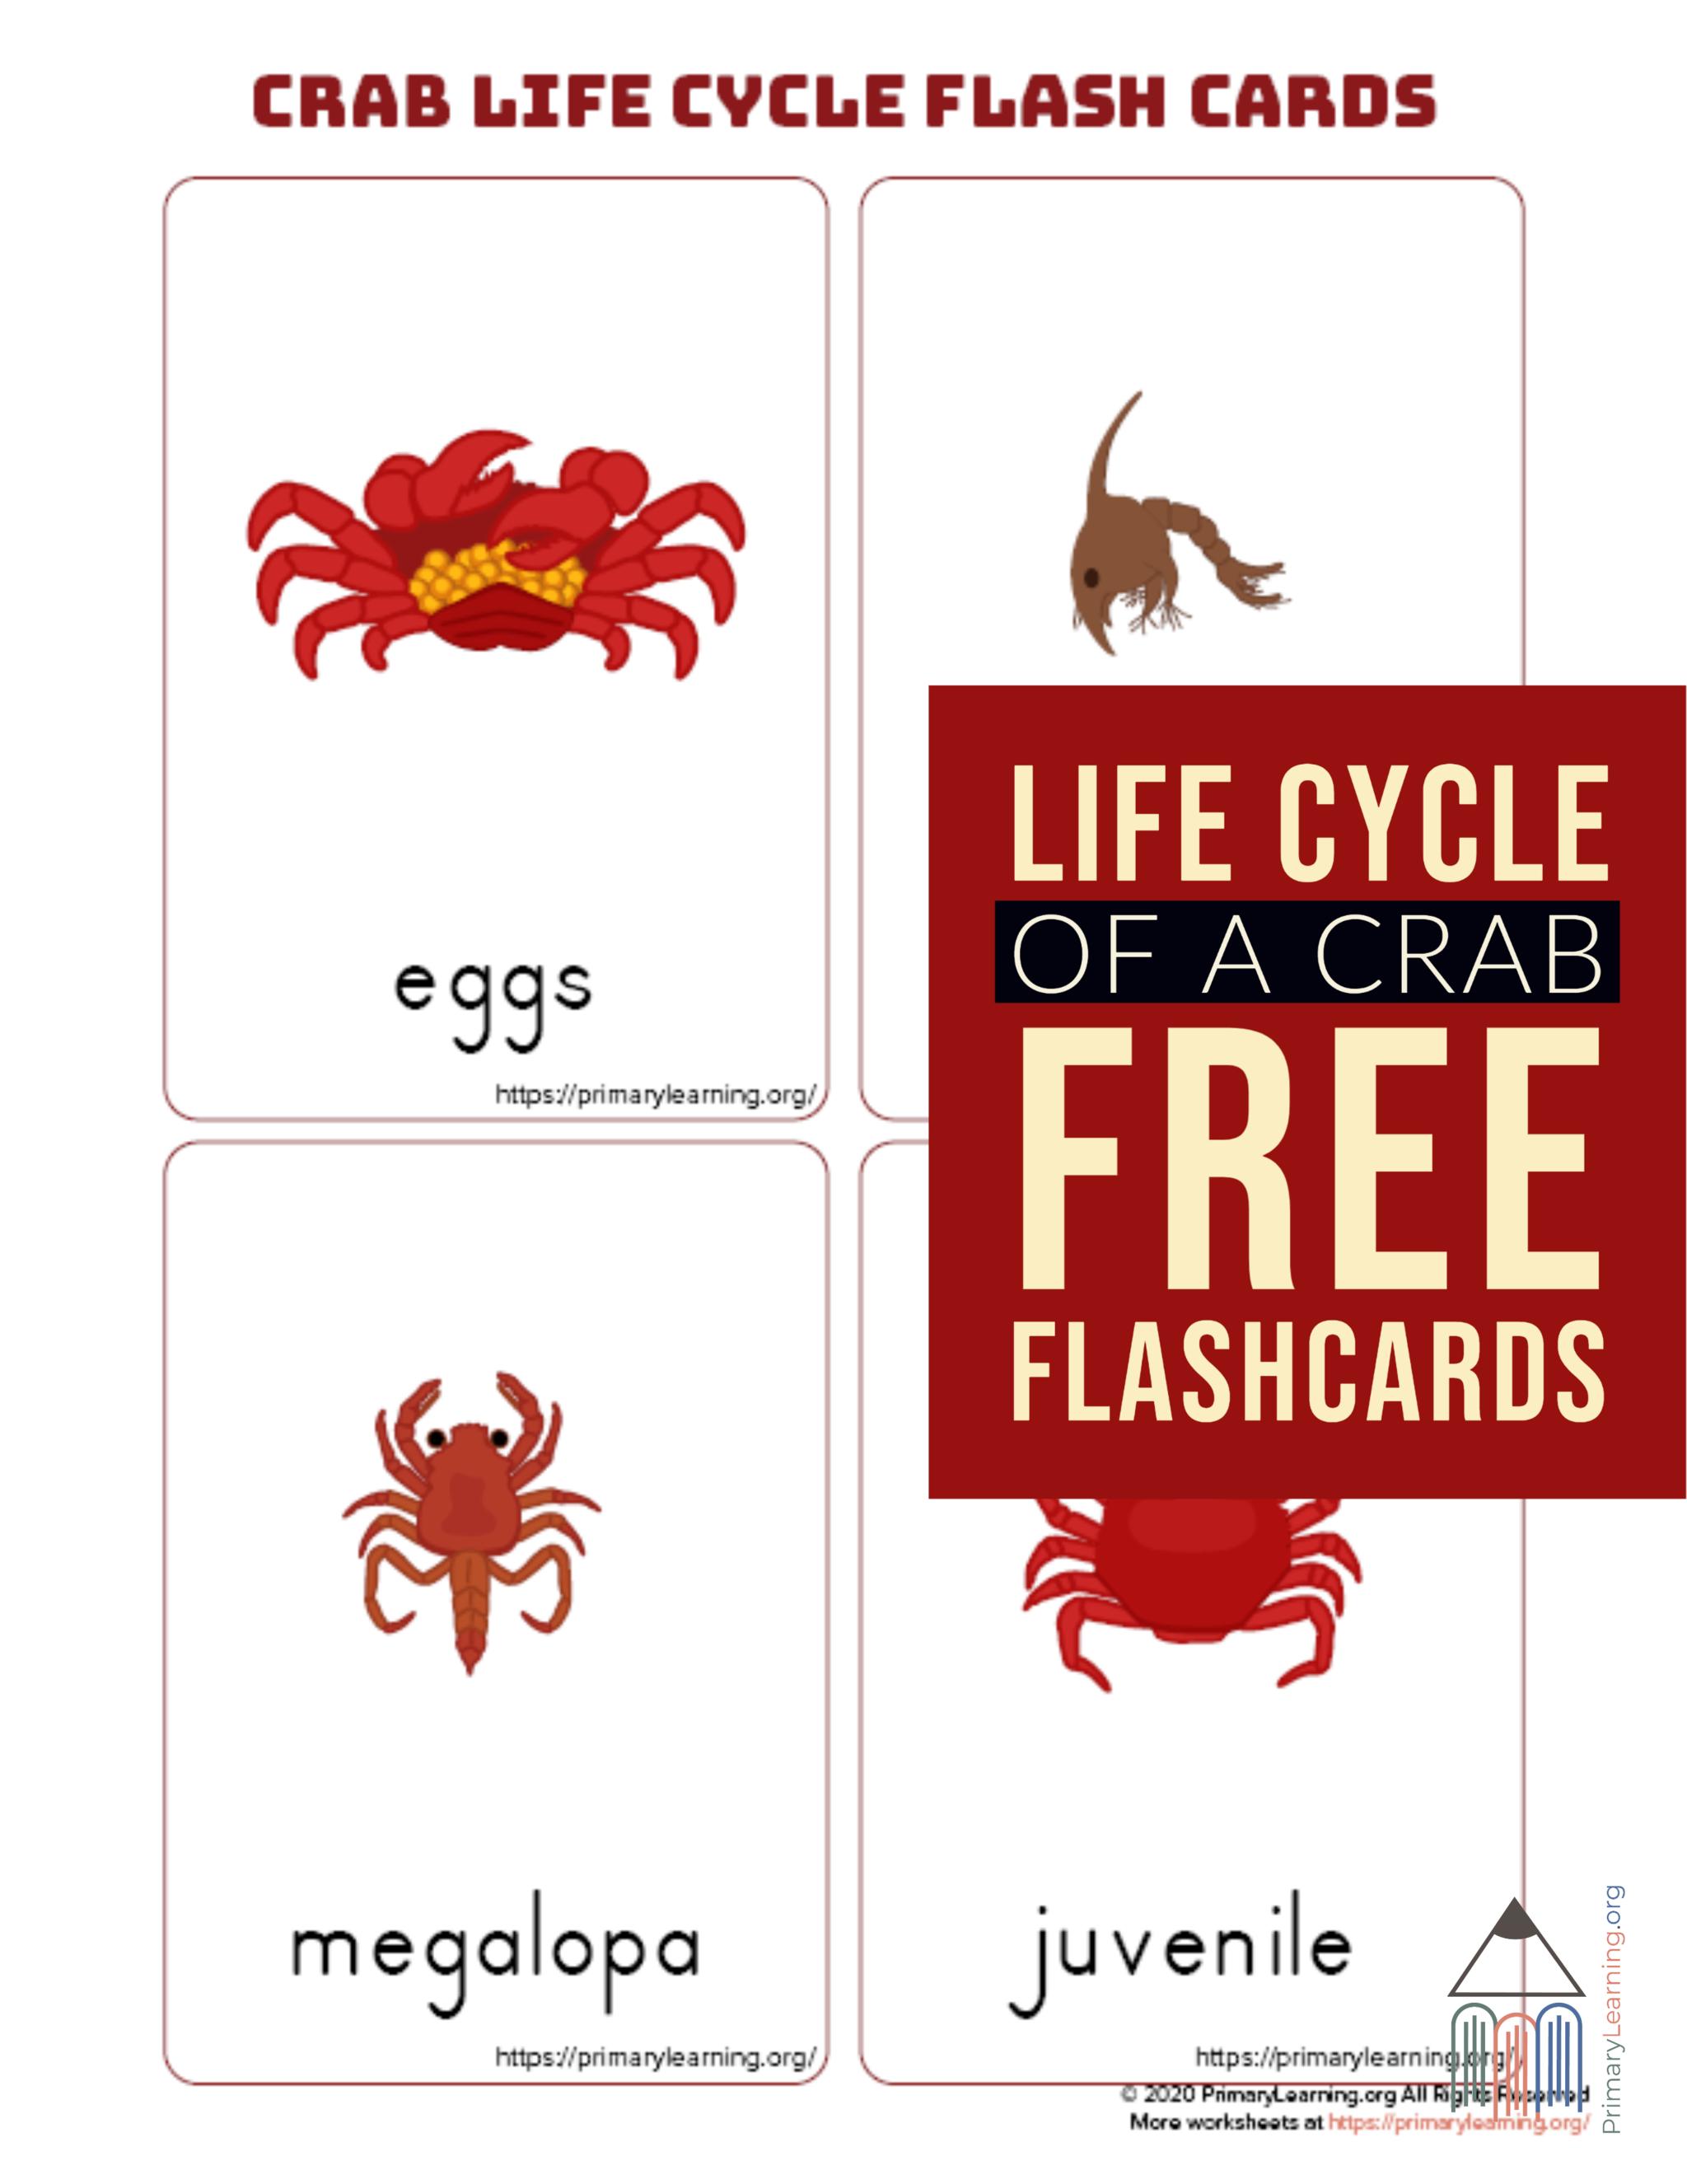 Crab Life Cycle Flashcards